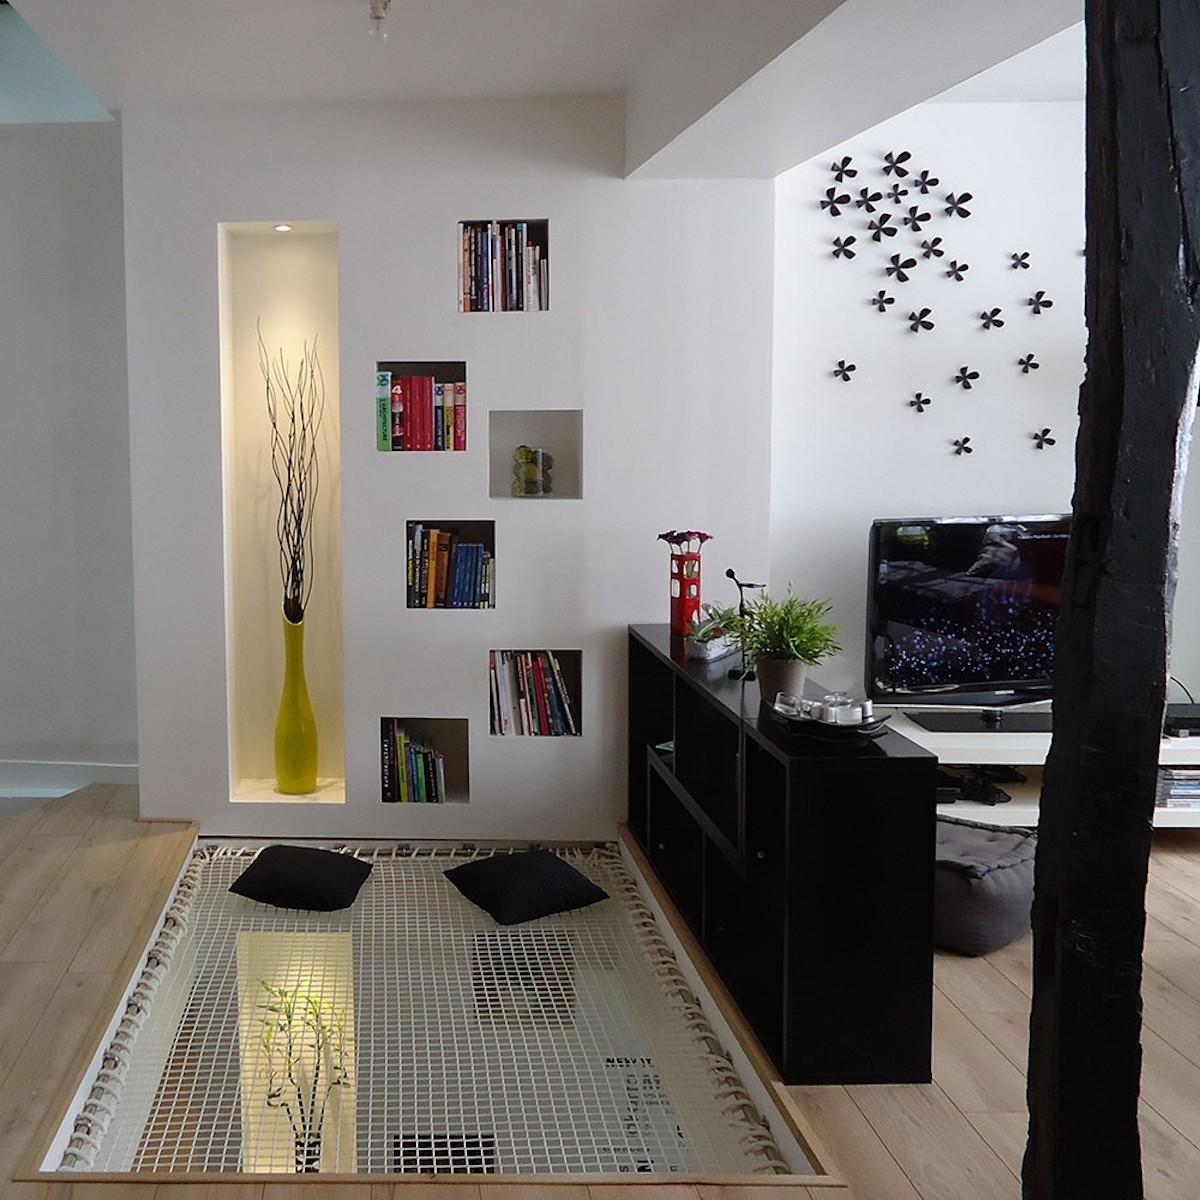 filet d habitation hamac espace de repos - blog déco - clemaroundtheocrner